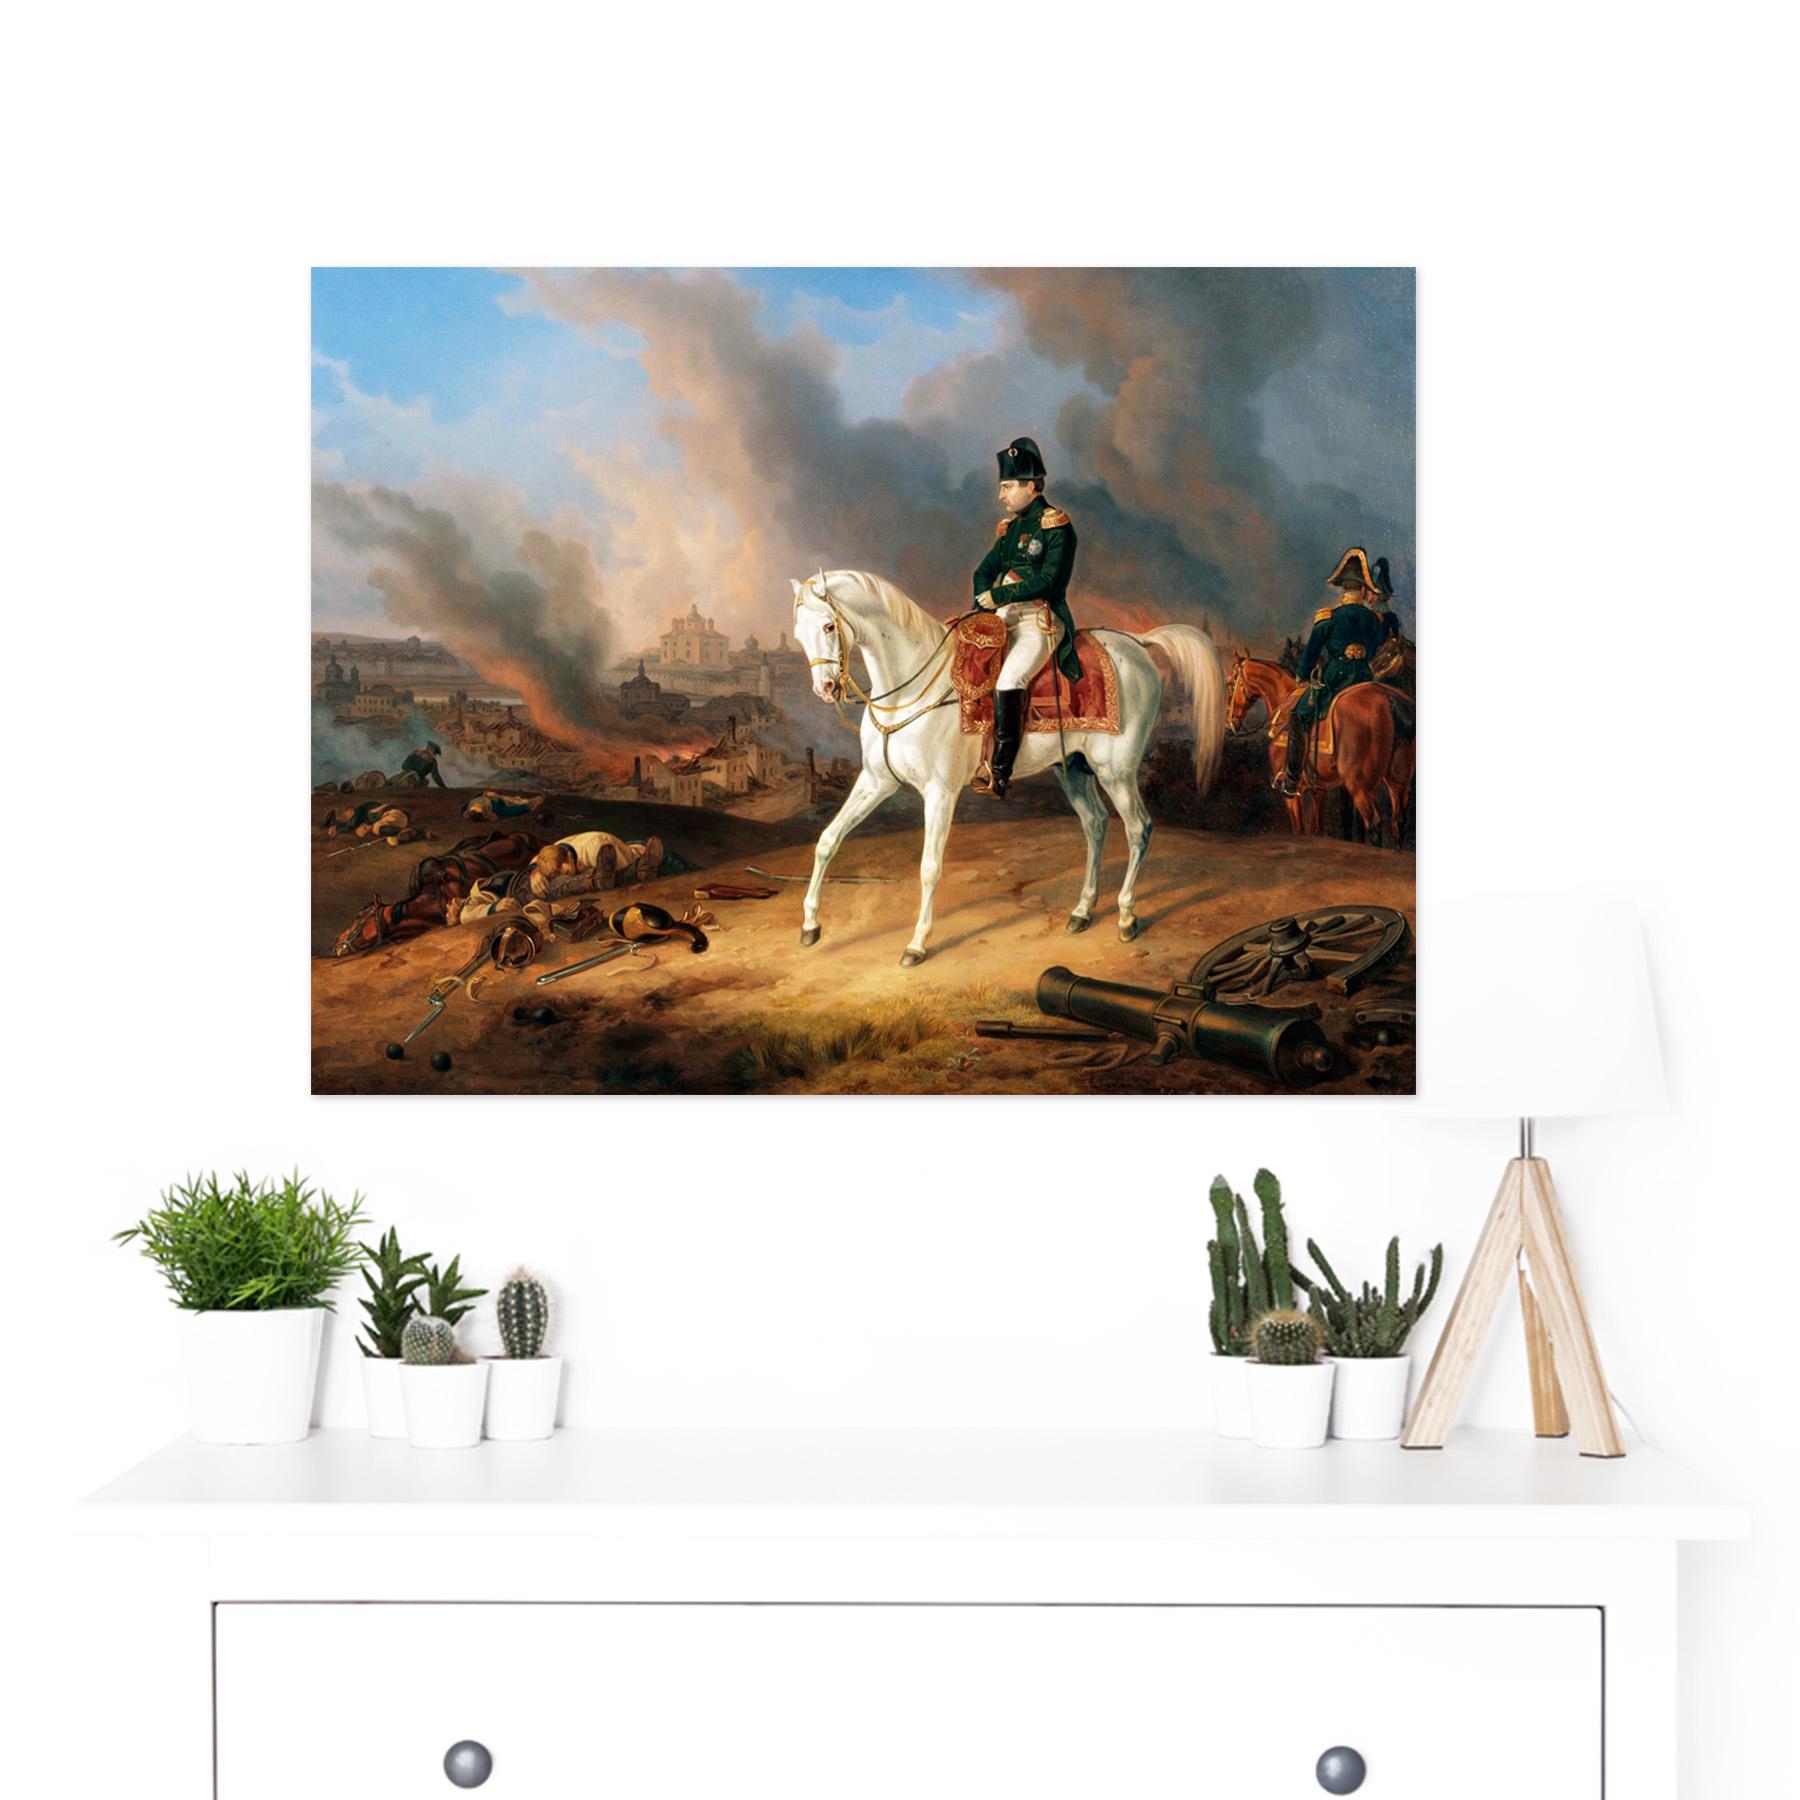 Adam Napoleon Burning Smolensk White Horse Painting Large Framed Art Print Ebay